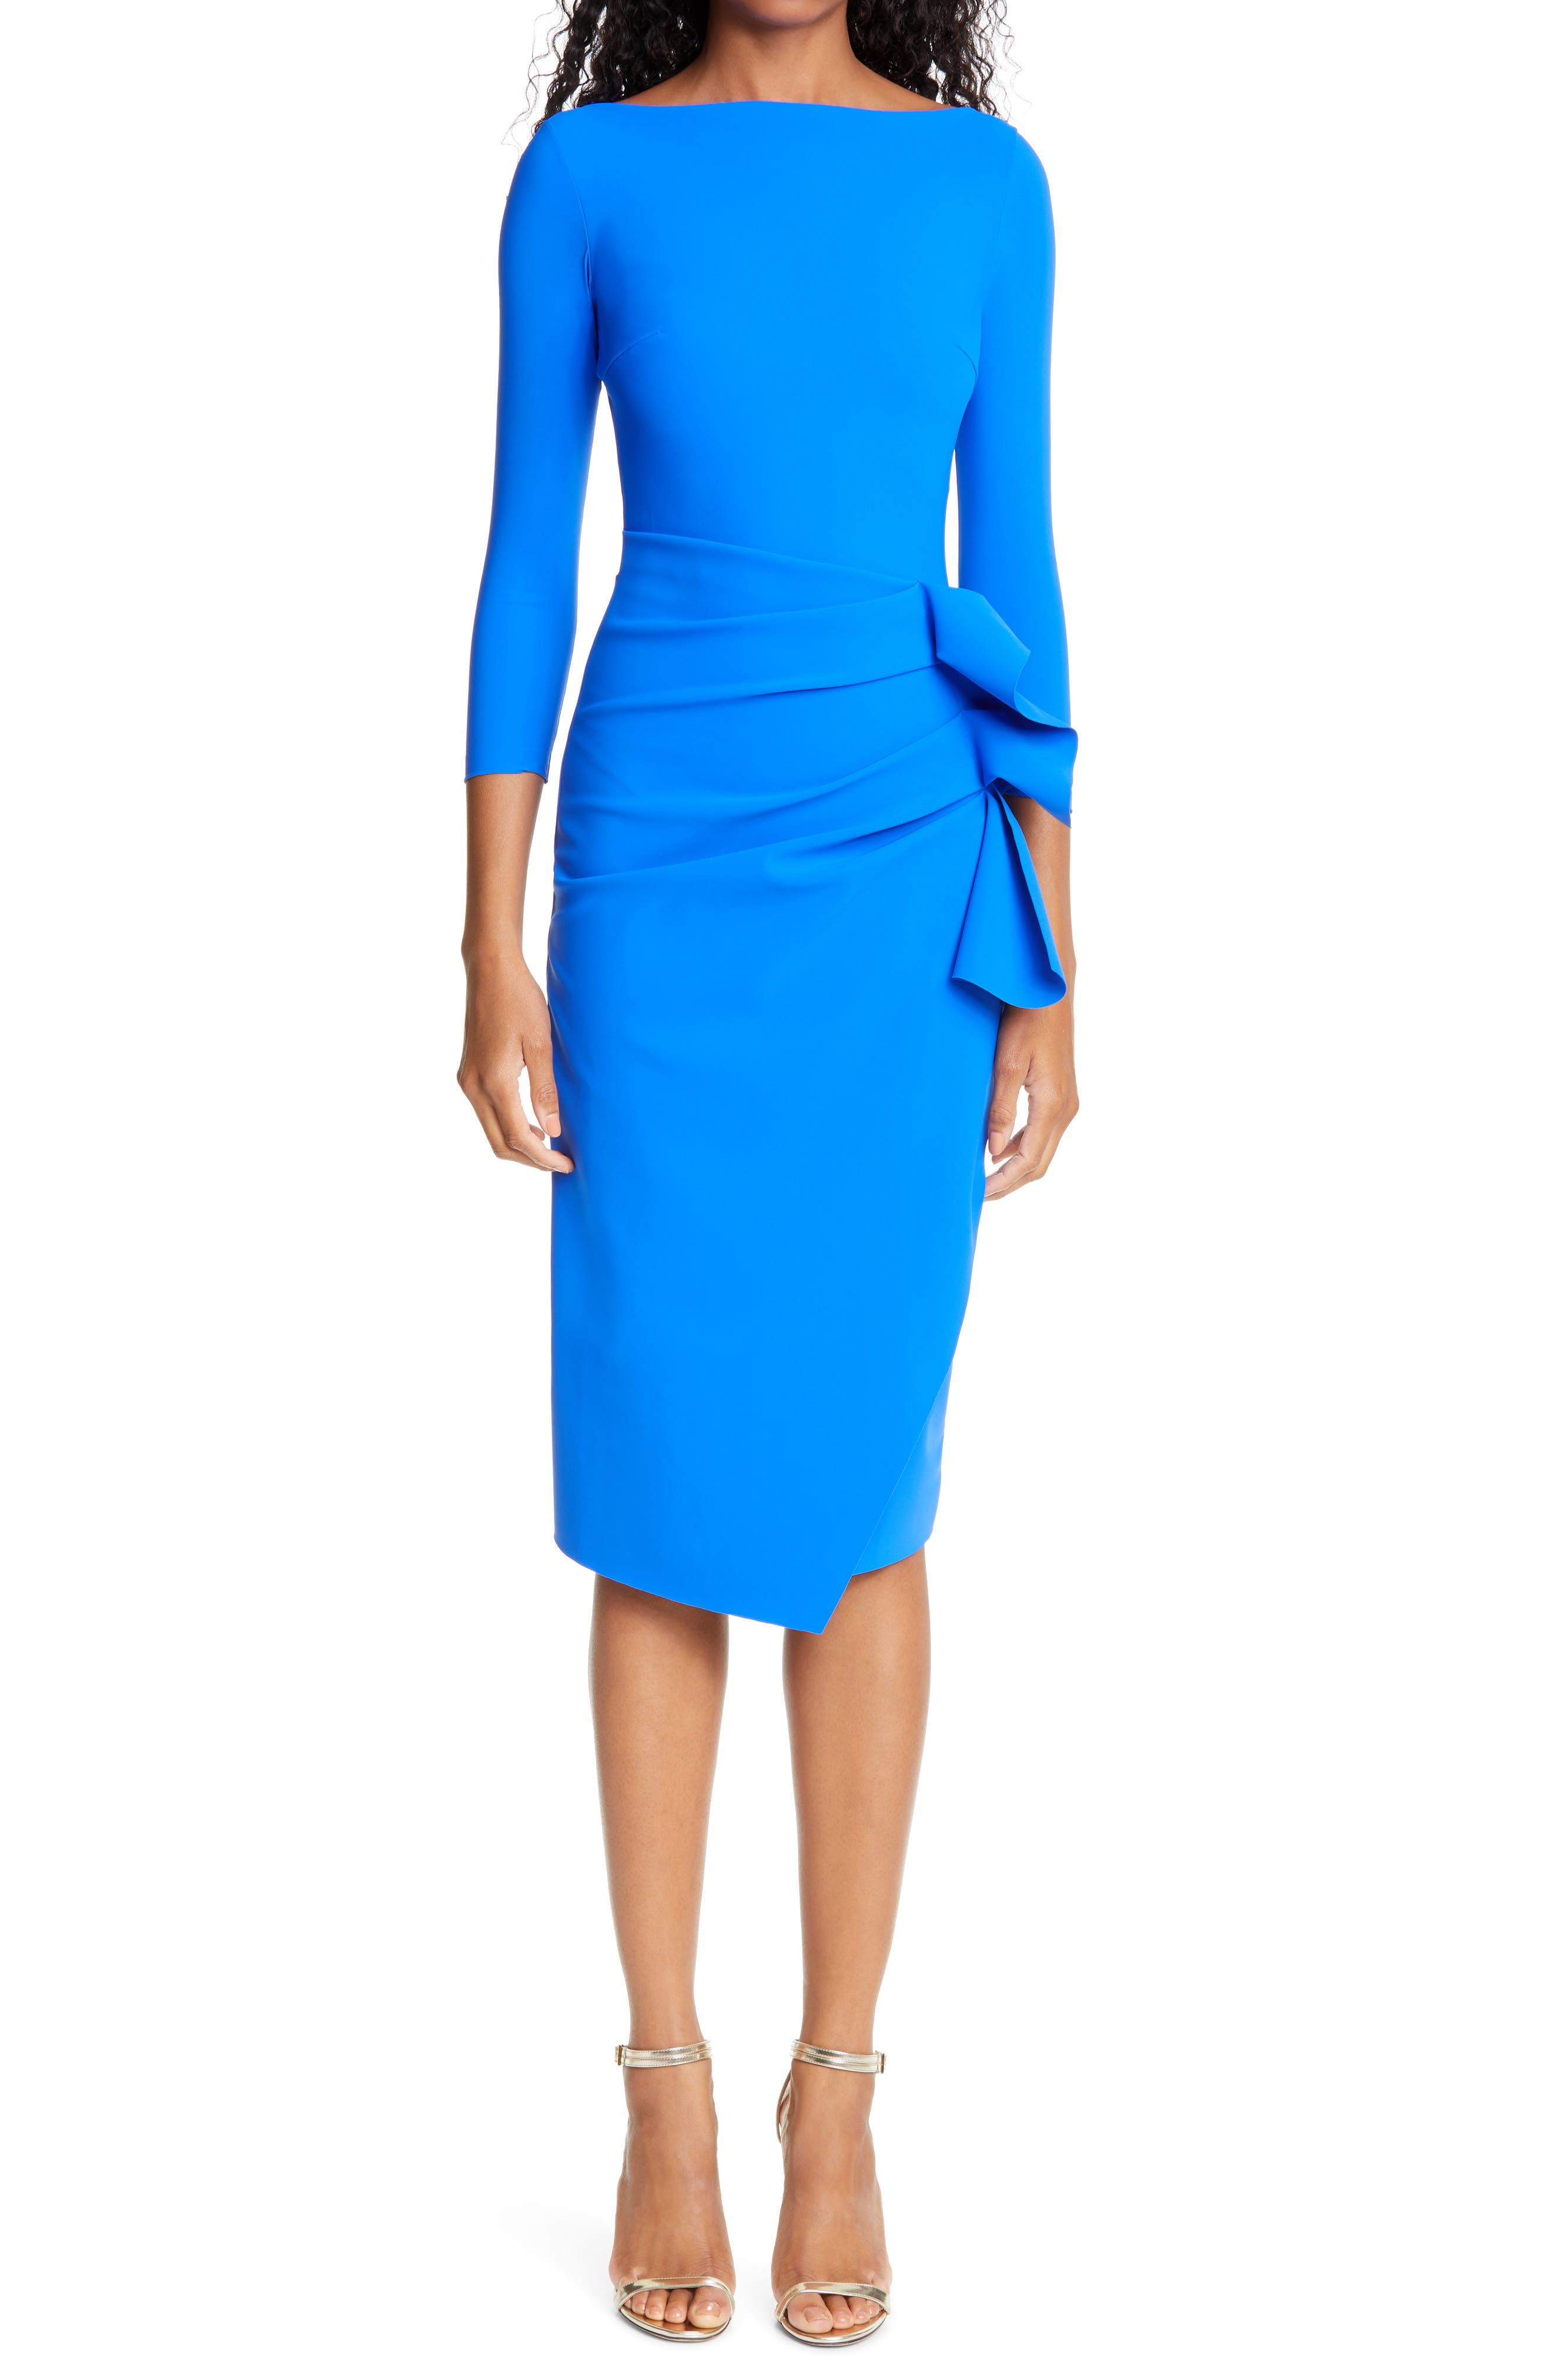 Chiara Boni La Petite Robe Zelma Cocktail Dress | Nordstrom